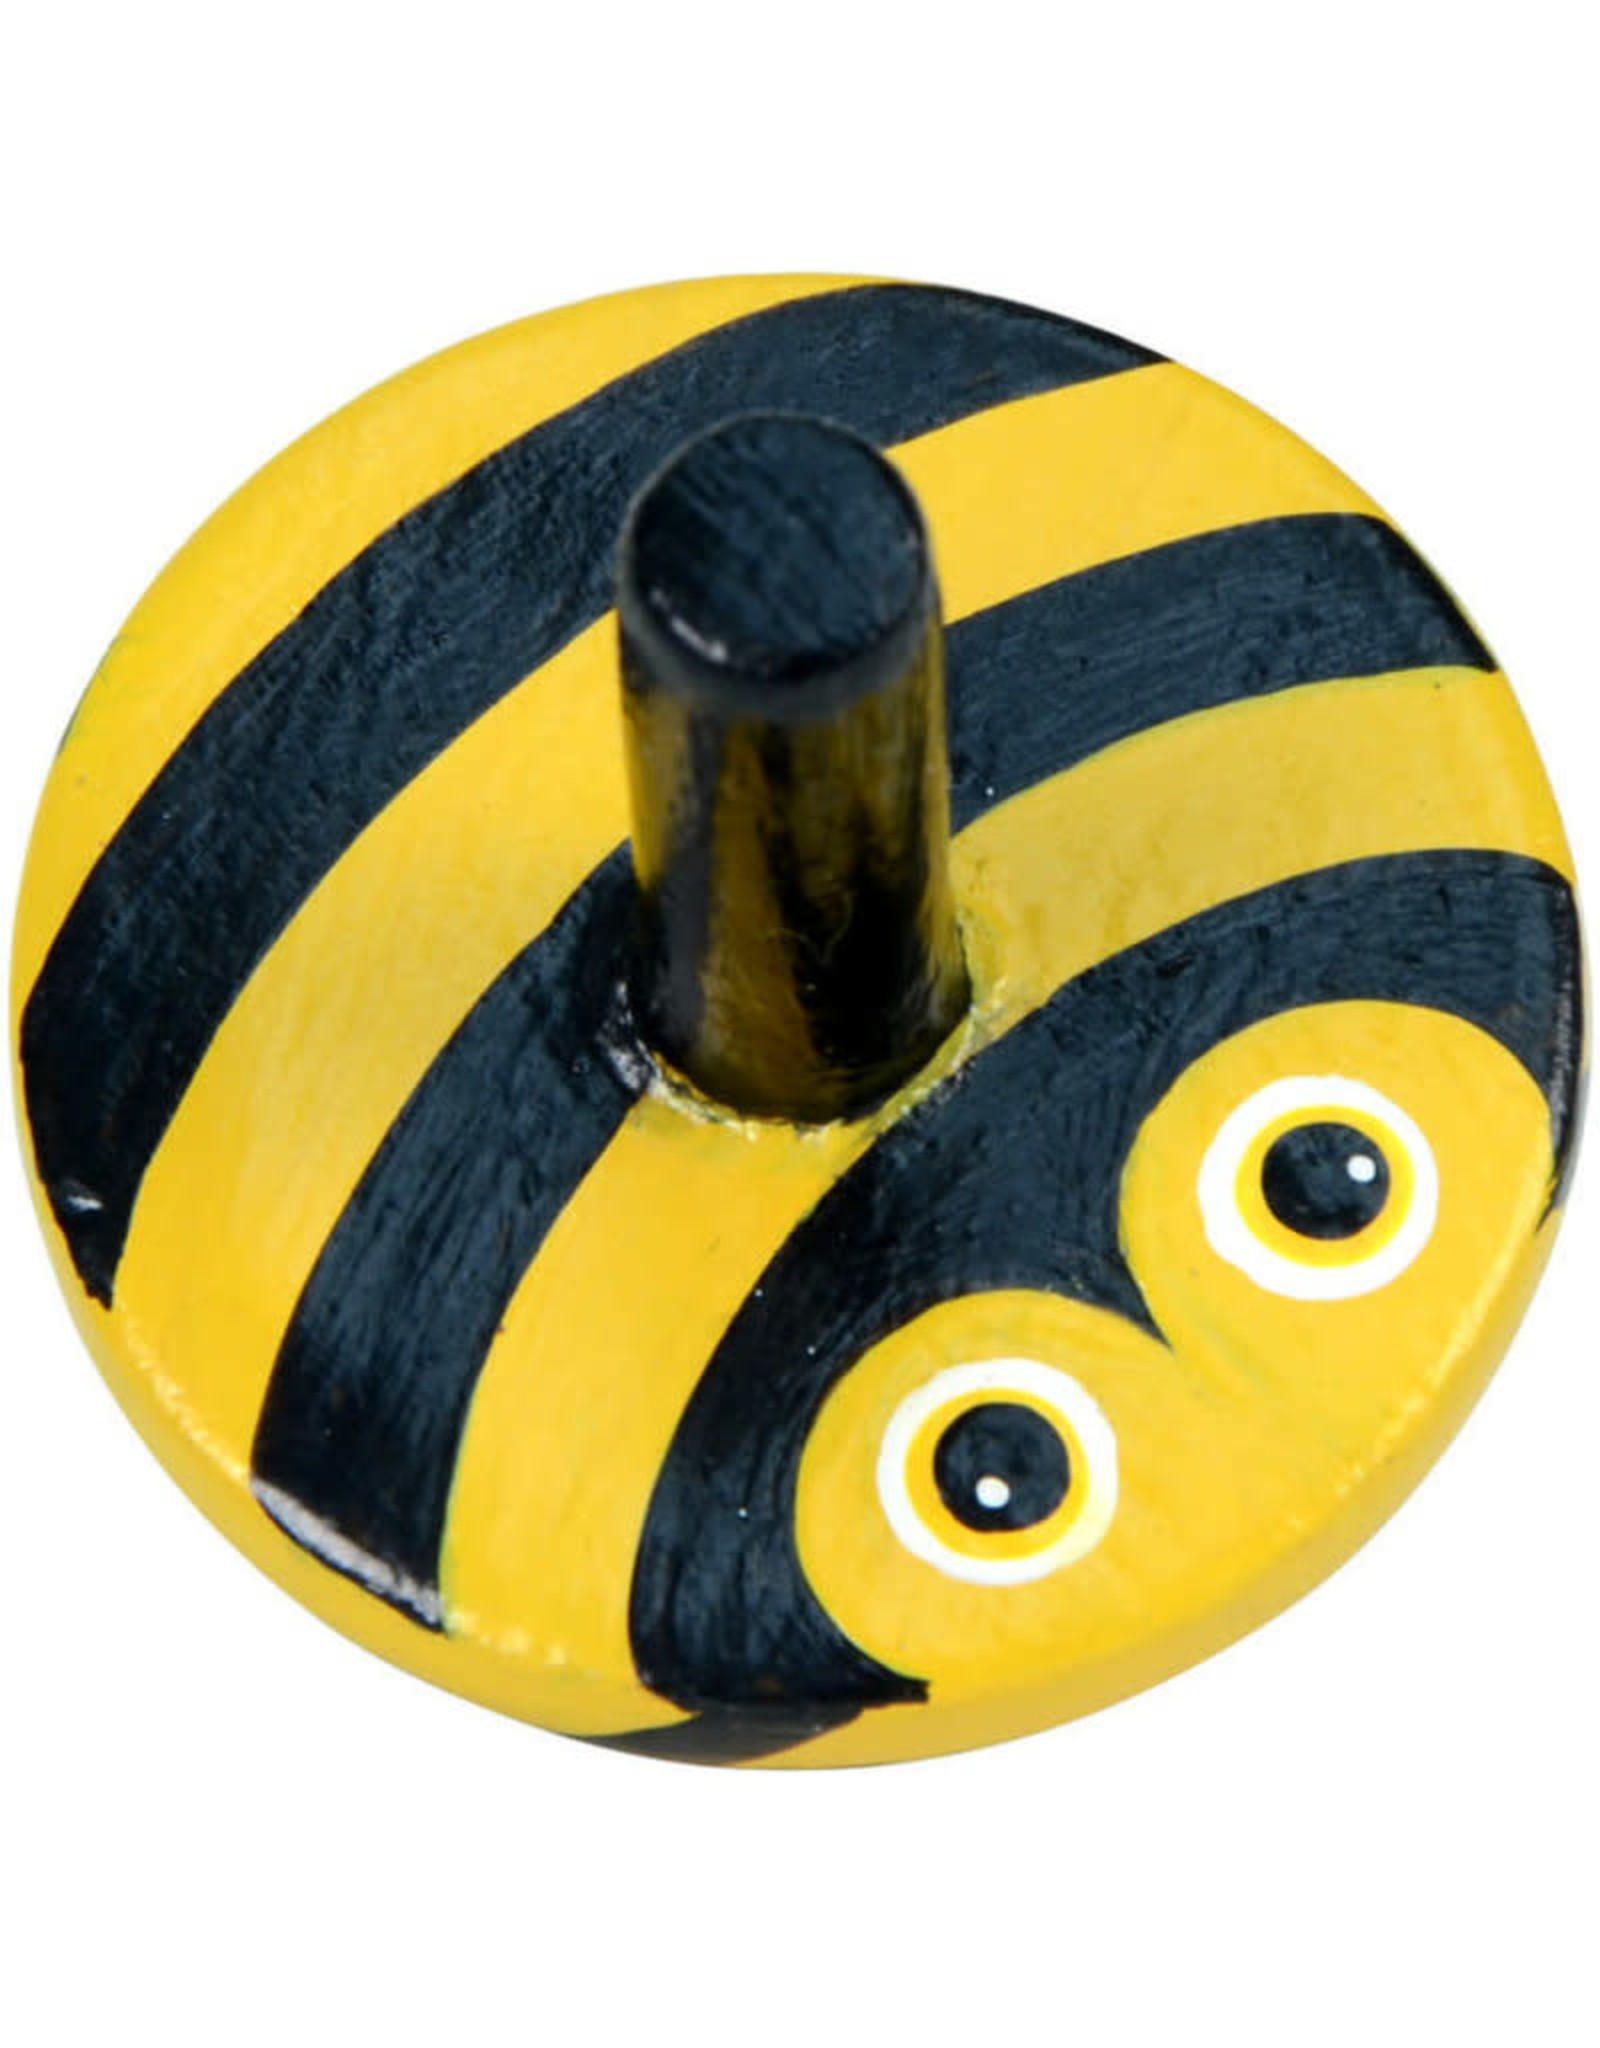 Spinning Bumblebee Top